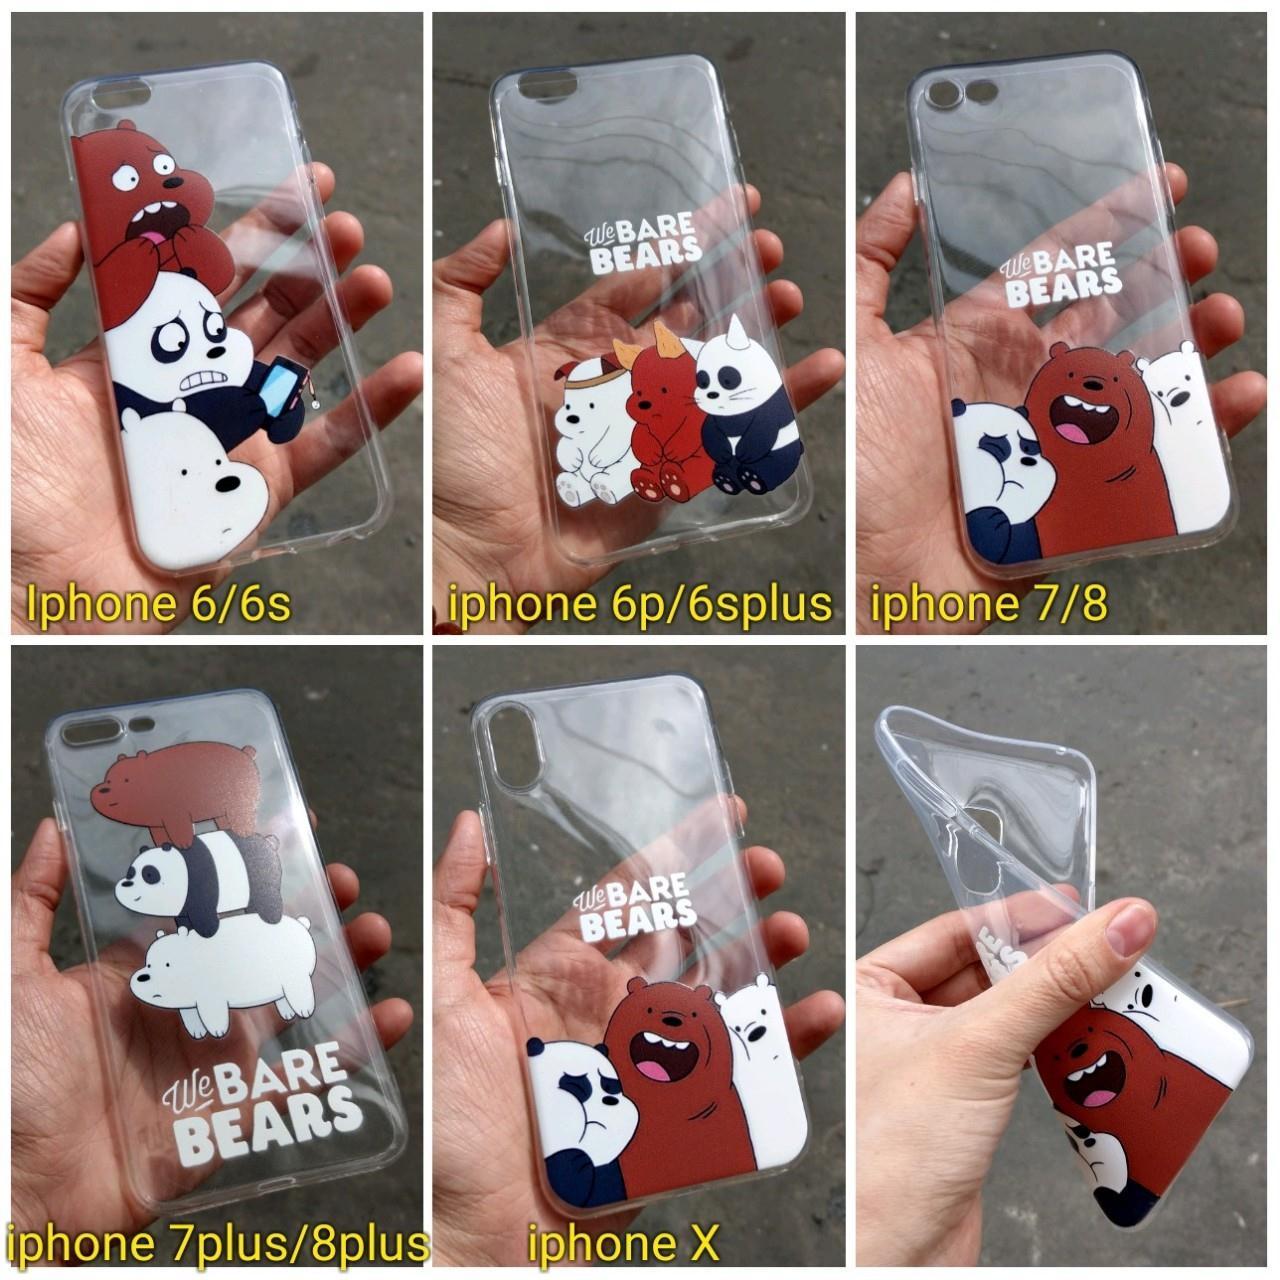 Ốp lưng silicon in hình 3 chú gấu Iphone 6plus / 6splus